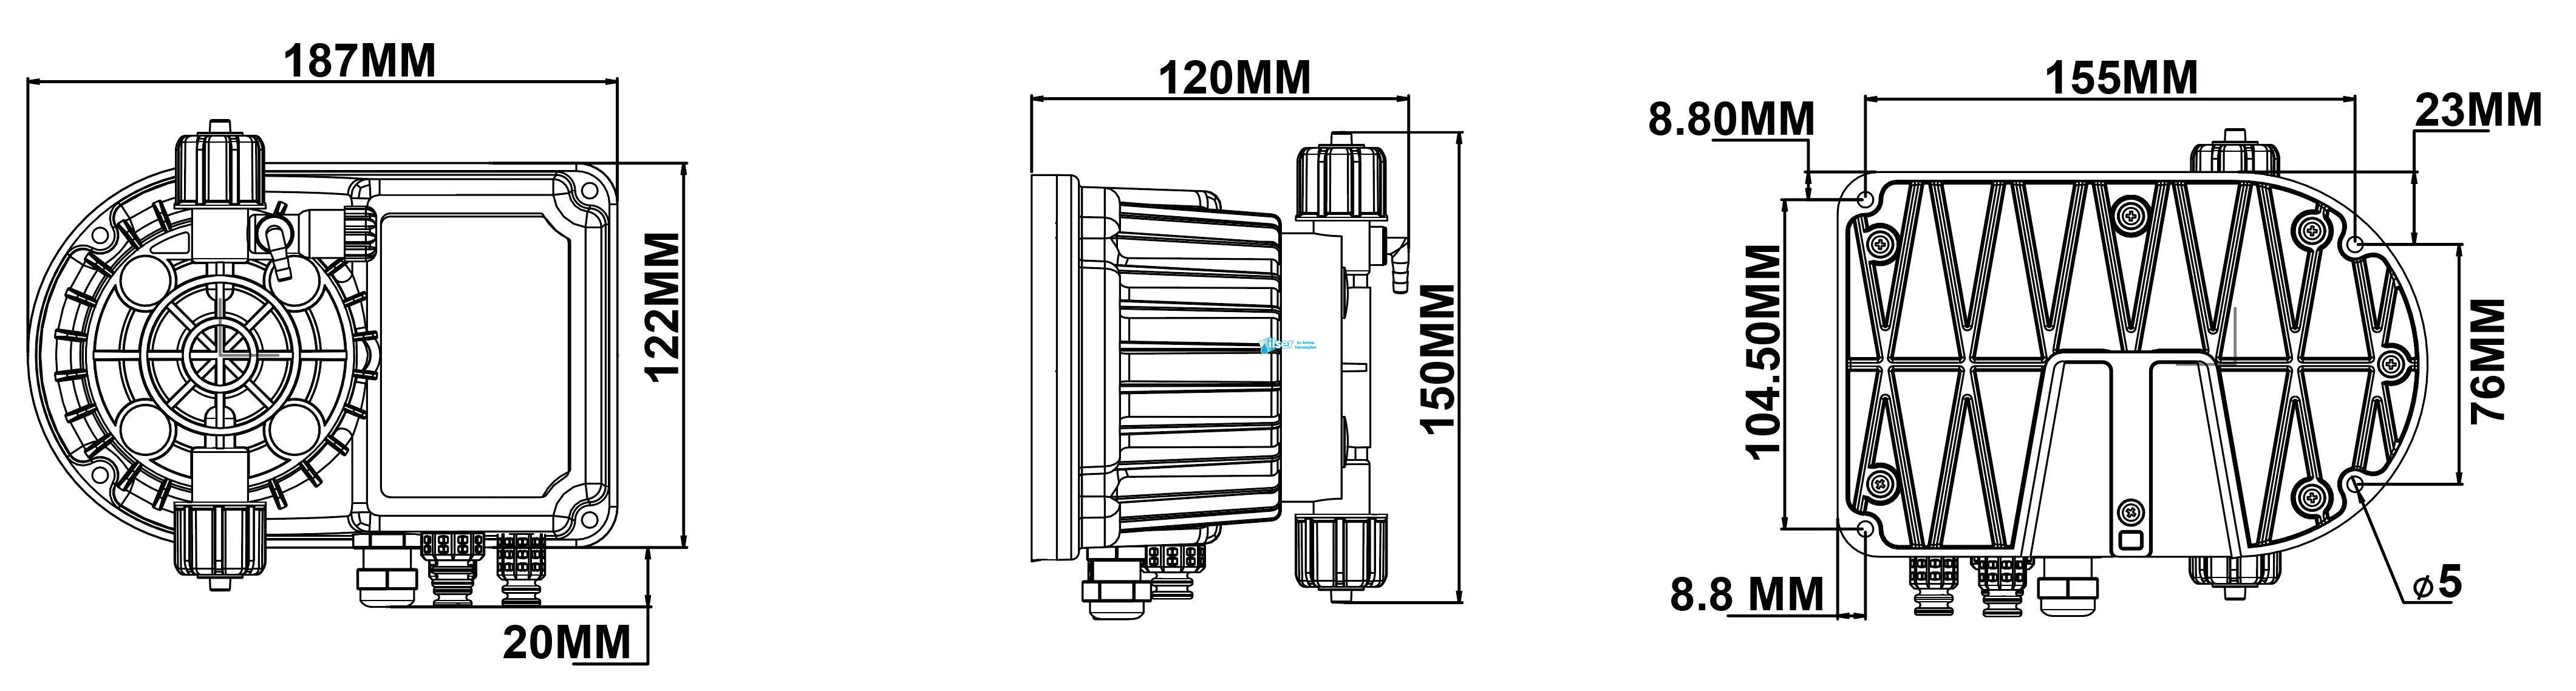 Antech DP LARA PR 2L/20B V220FAT